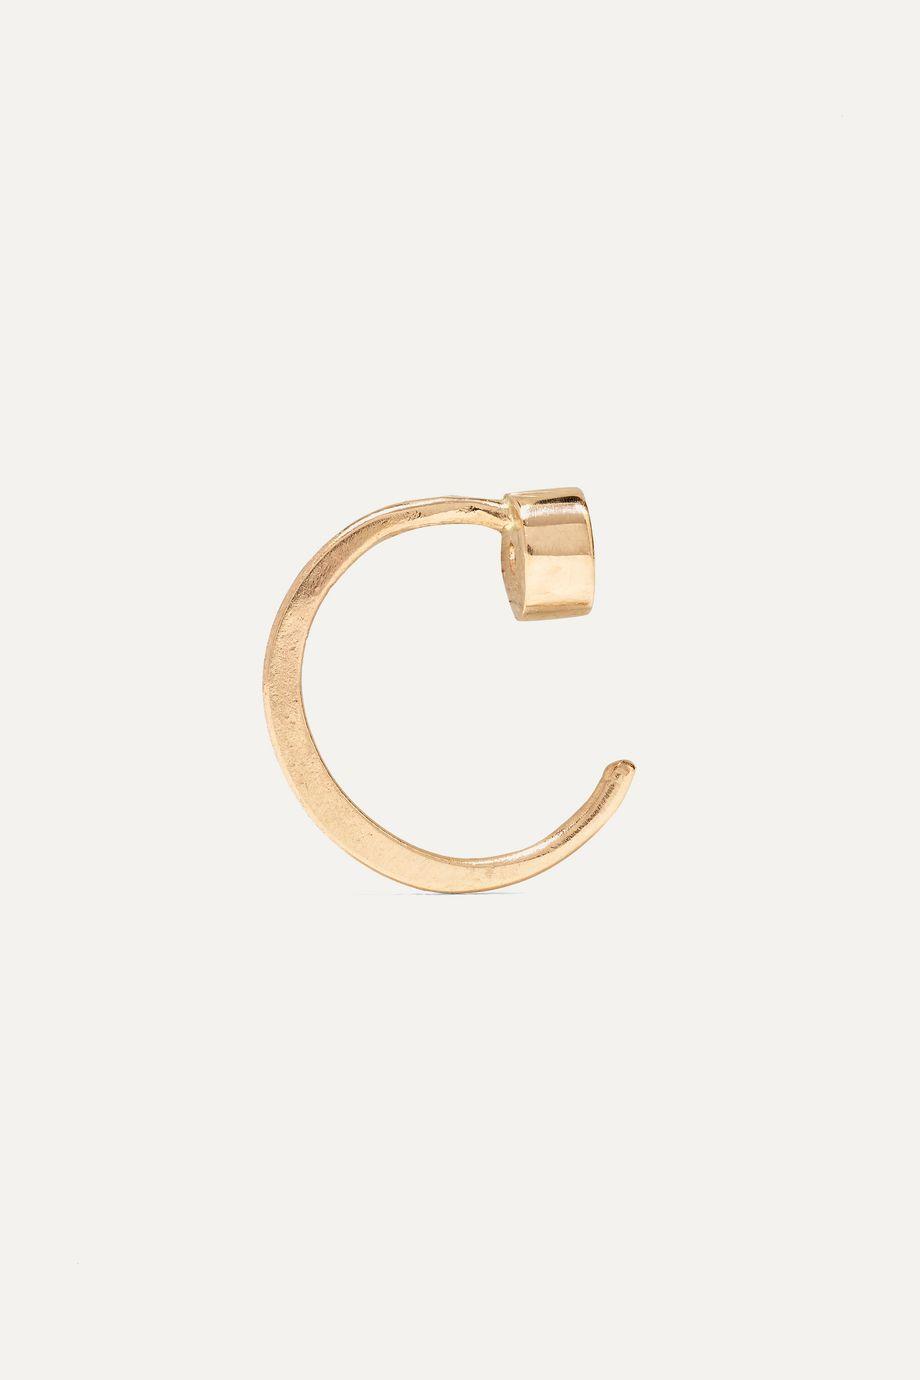 Melissa Joy Manning 14-karat gold diamond earrings